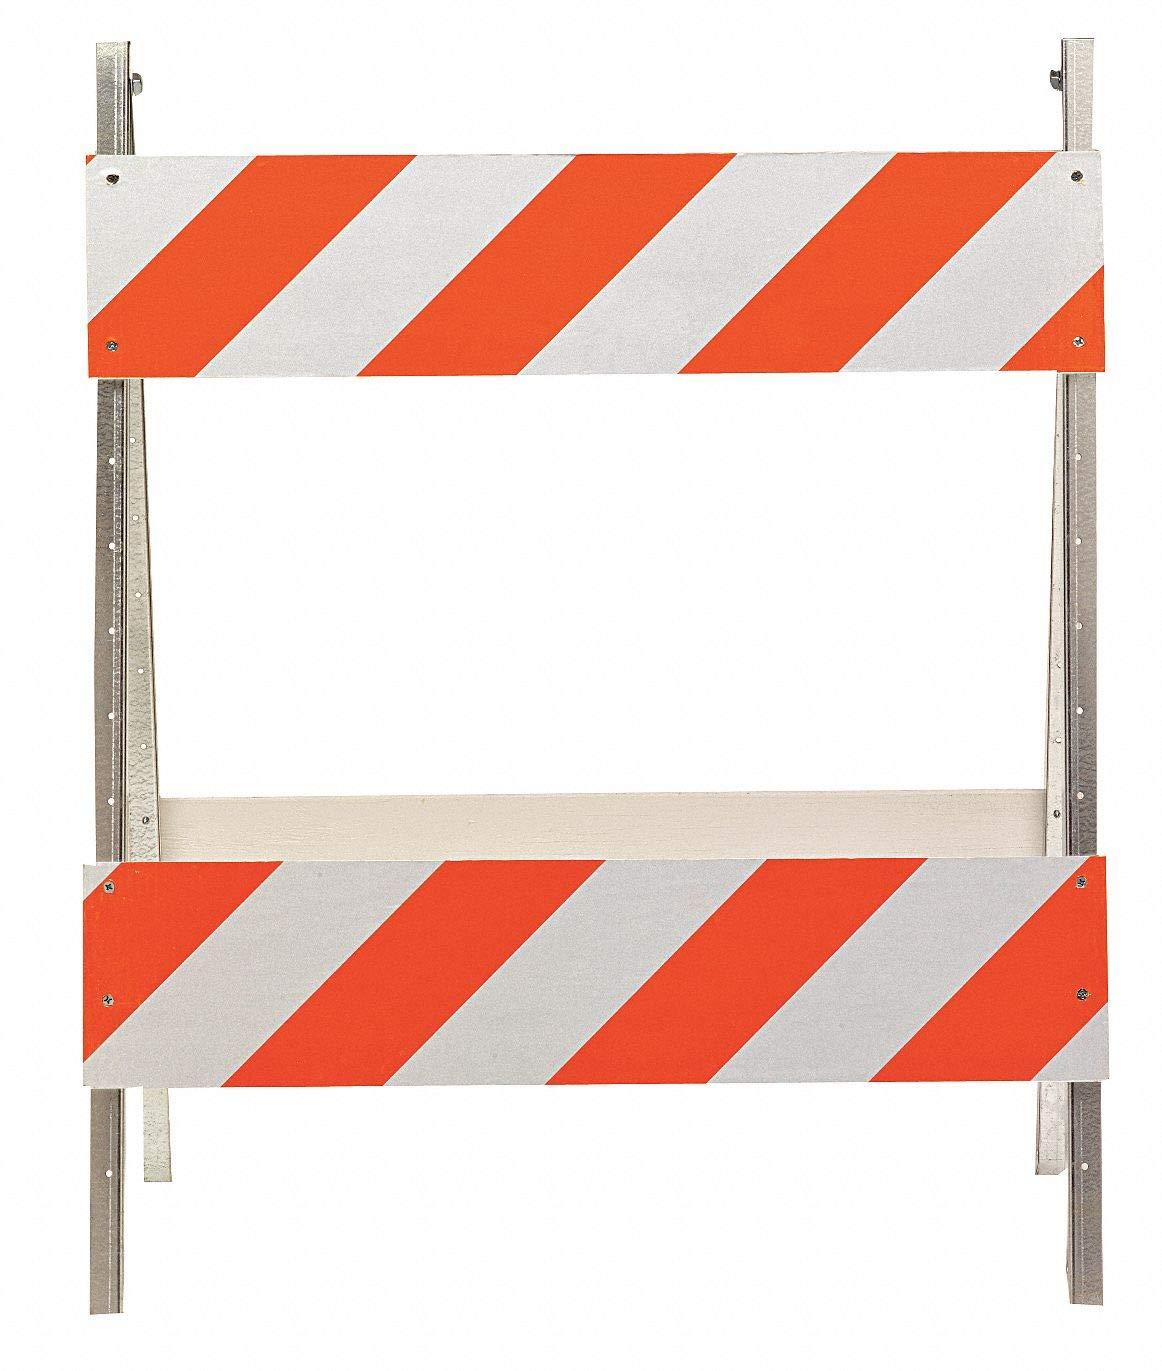 Type2 Orange White Legframe 41Inx41Inx36In 2040024088 Opening large Las Vegas Mall release sale